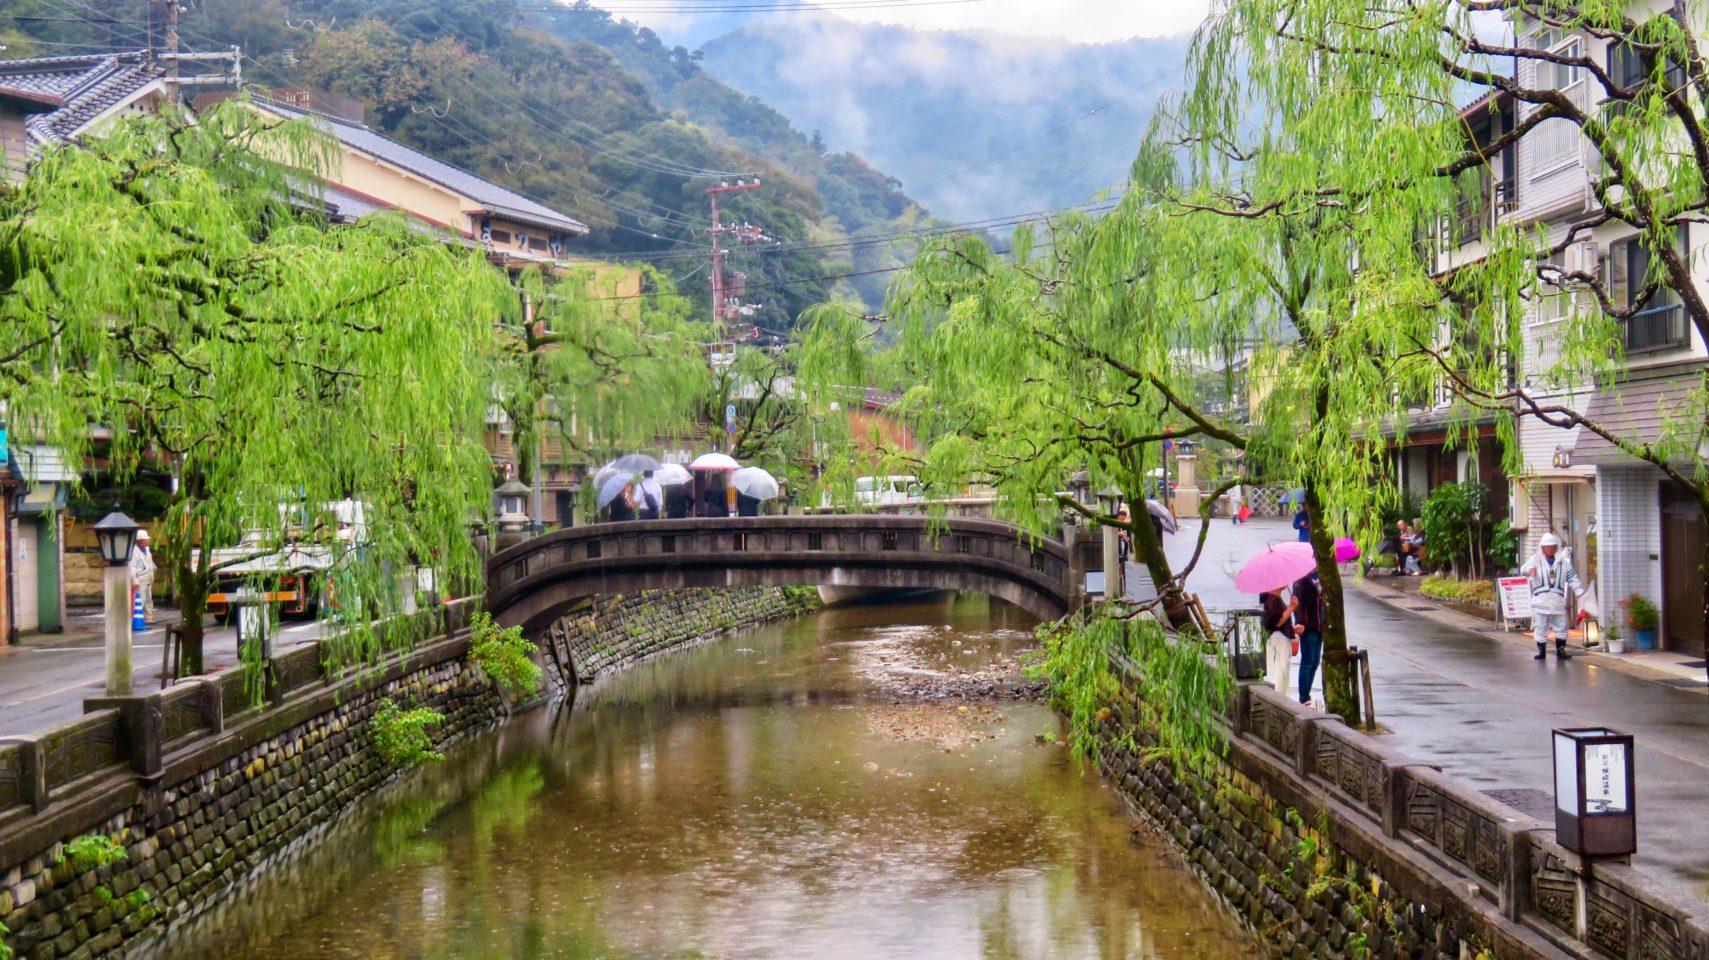 Japan Favorite Experiences ~ The Hot Springs town of Kinosaki Onsen in Japan